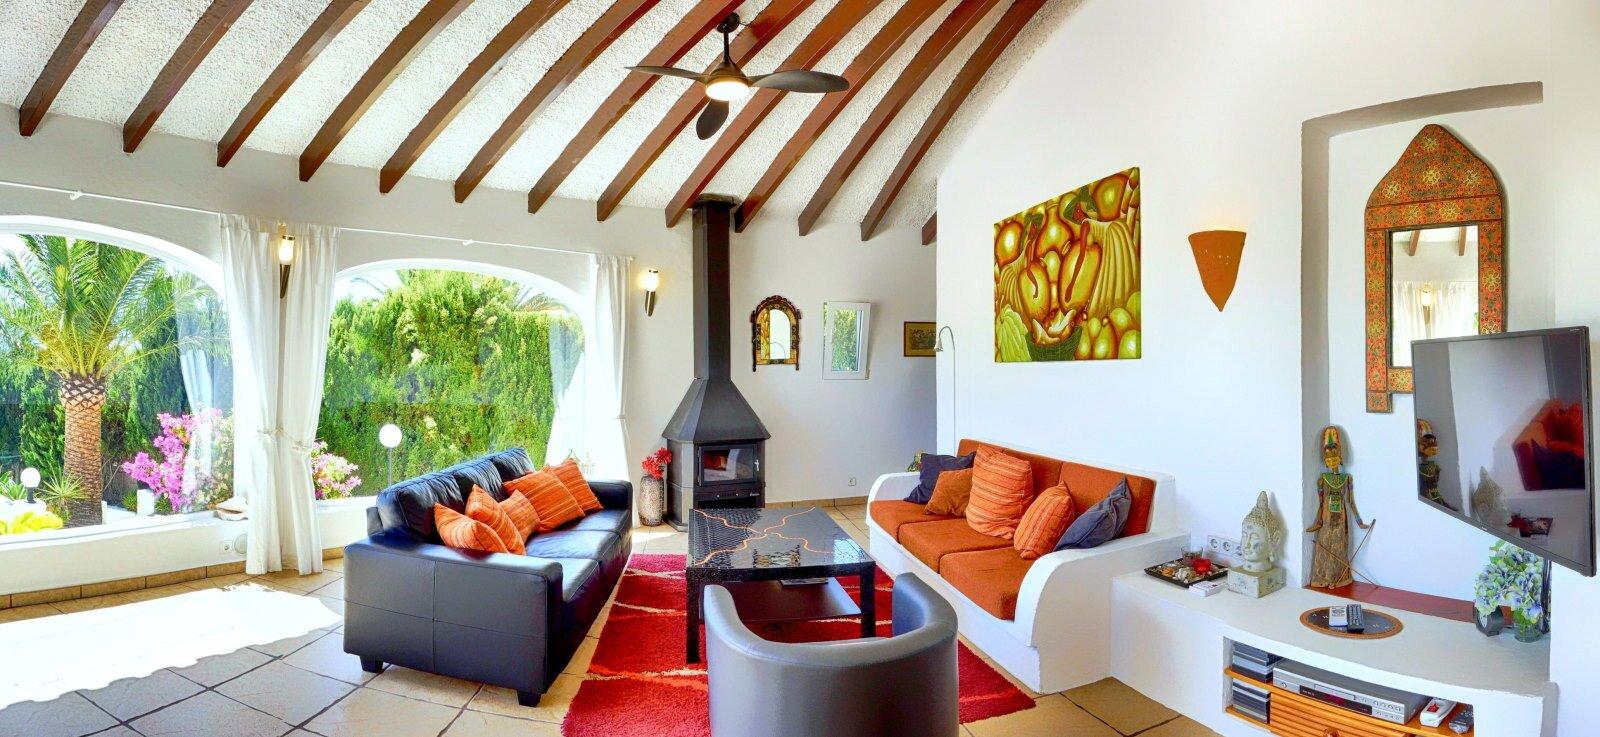 Casa Erimeli - Schlafzimmer blau